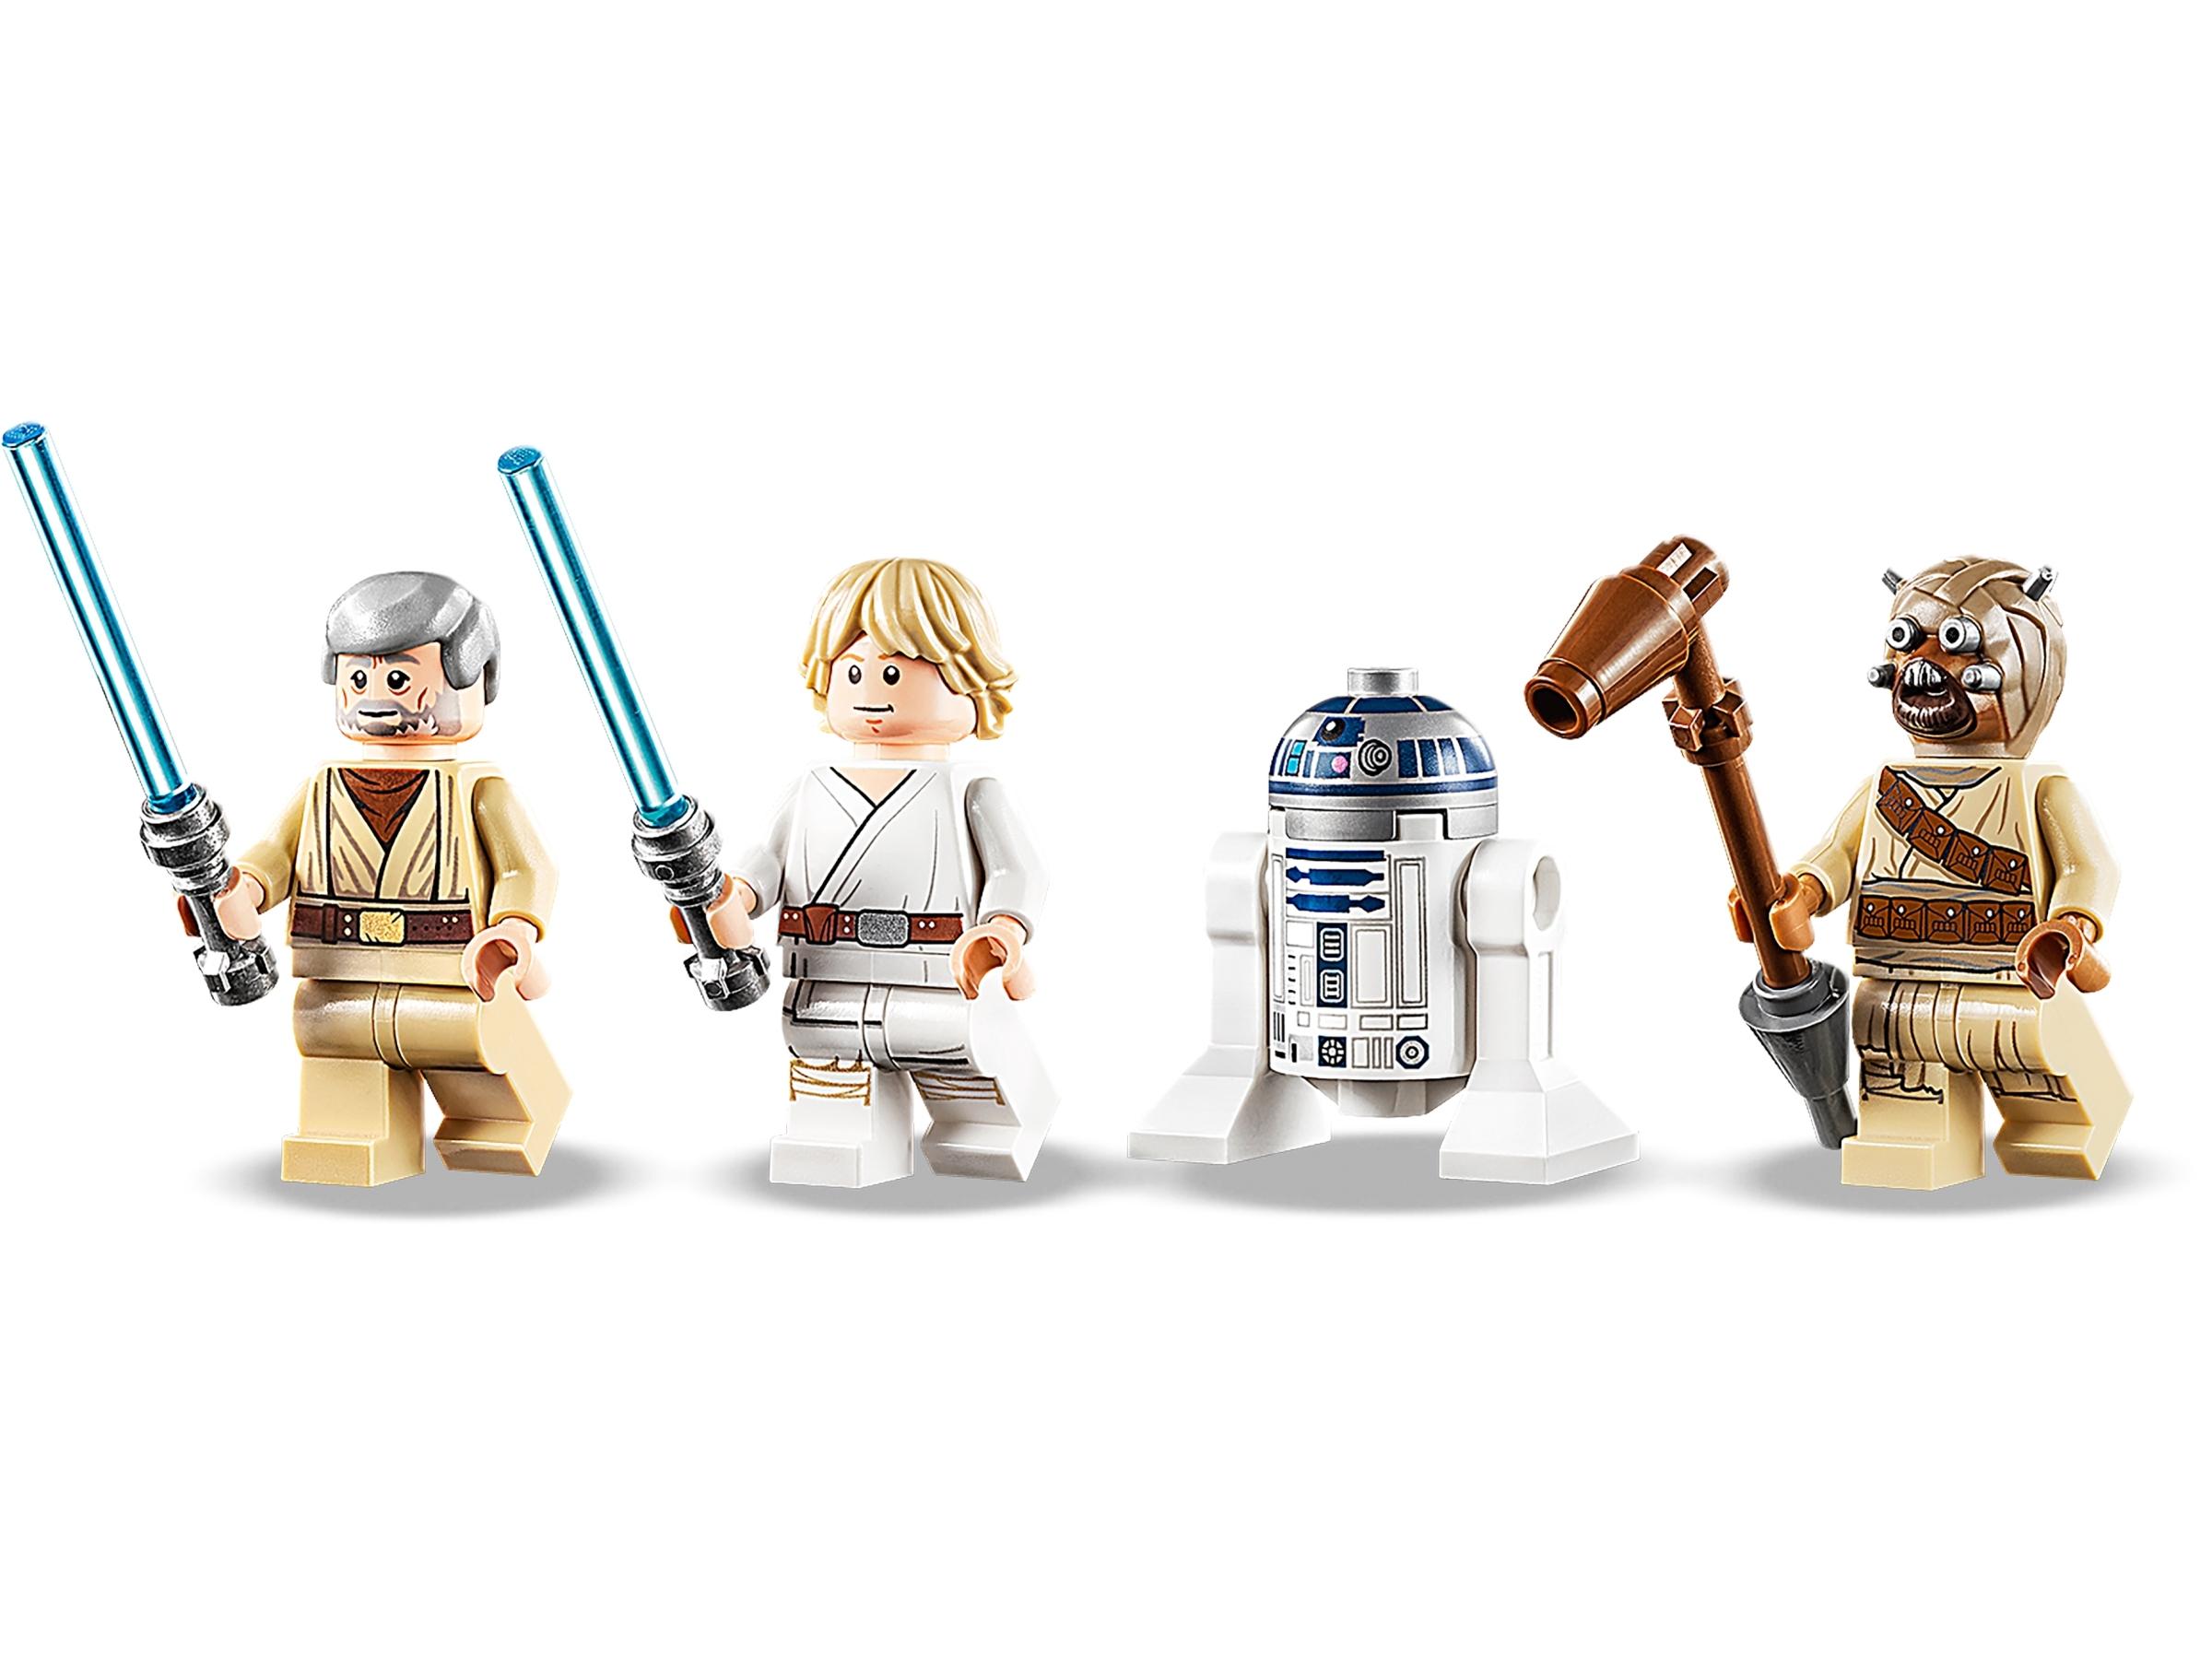 LEGO STAR WARS Obi-Wan Kenobi  MINIFIG brand new from Lego set #75270